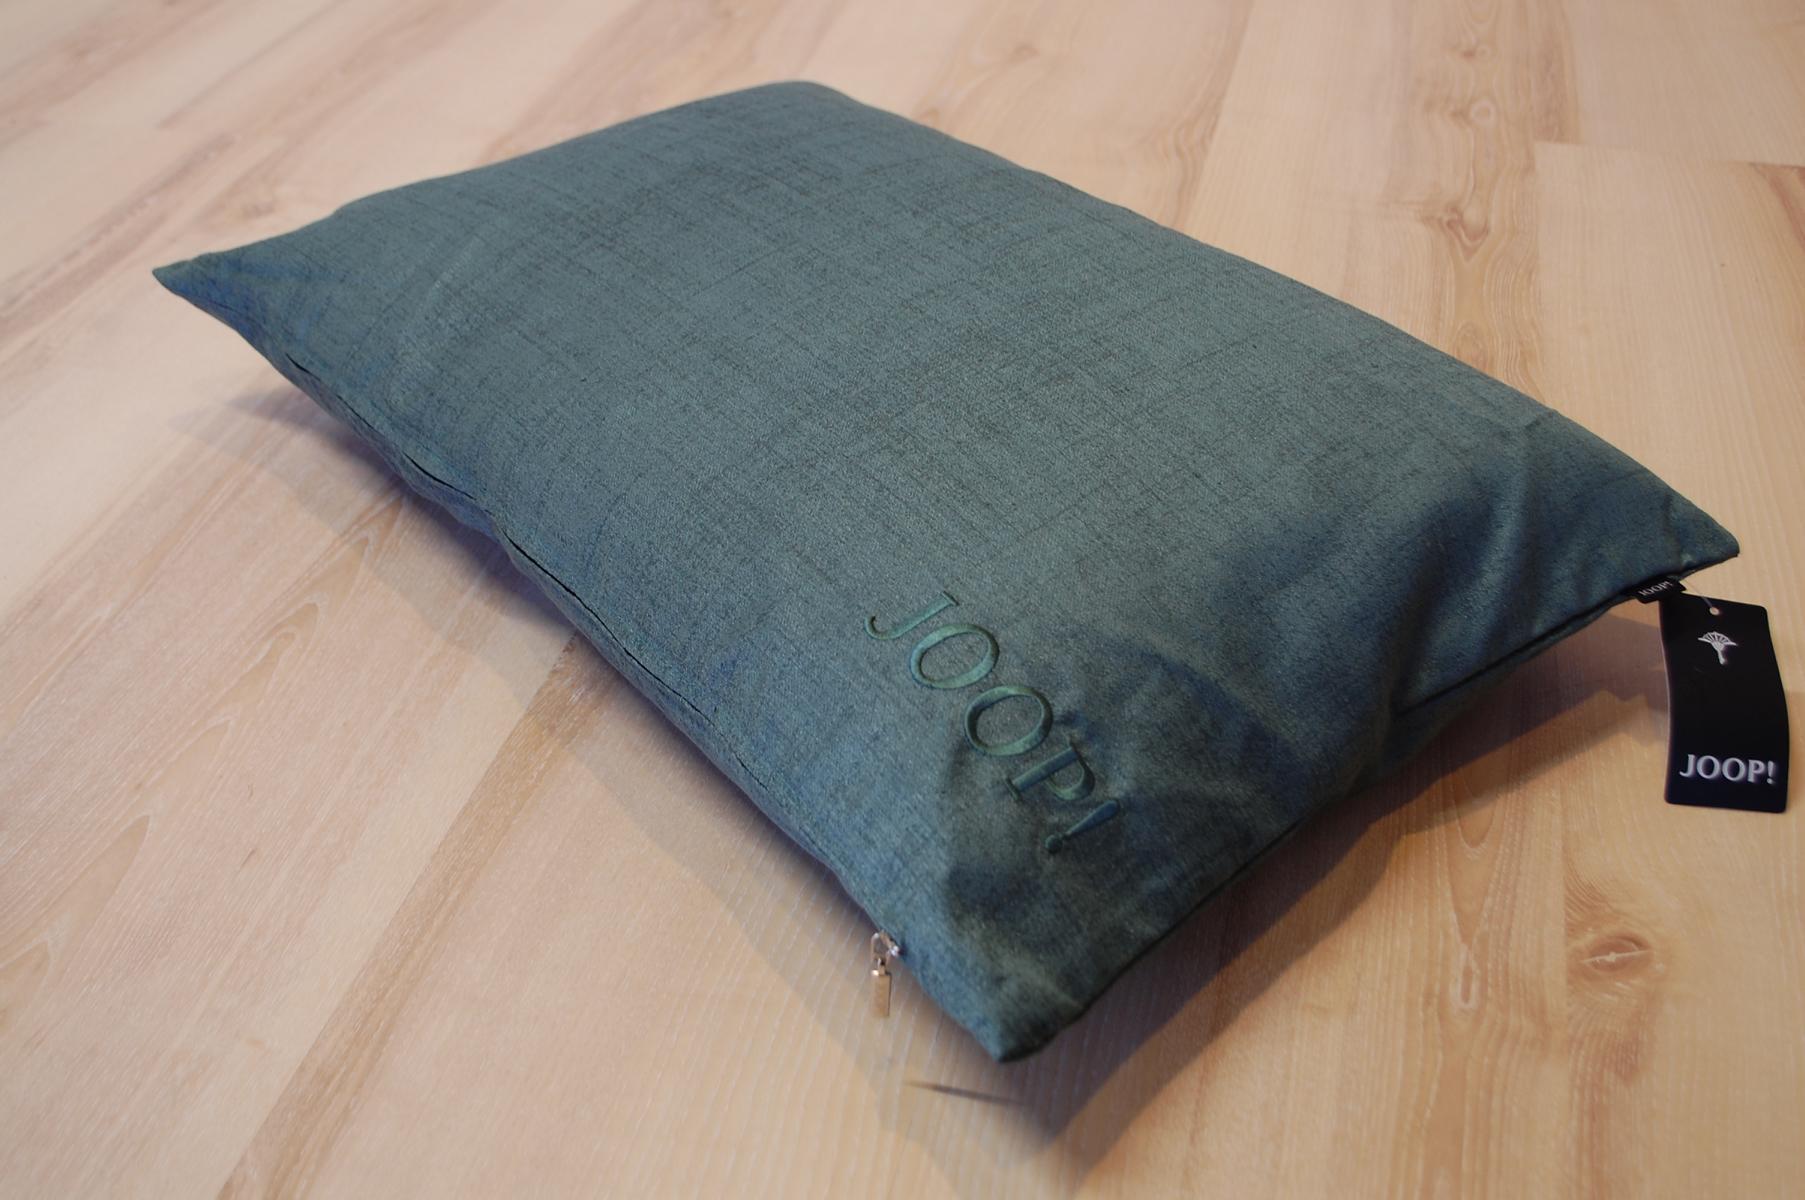 joop kissen texture 70522 096 petrol 40x60 cm inkl federf llung ebay. Black Bedroom Furniture Sets. Home Design Ideas